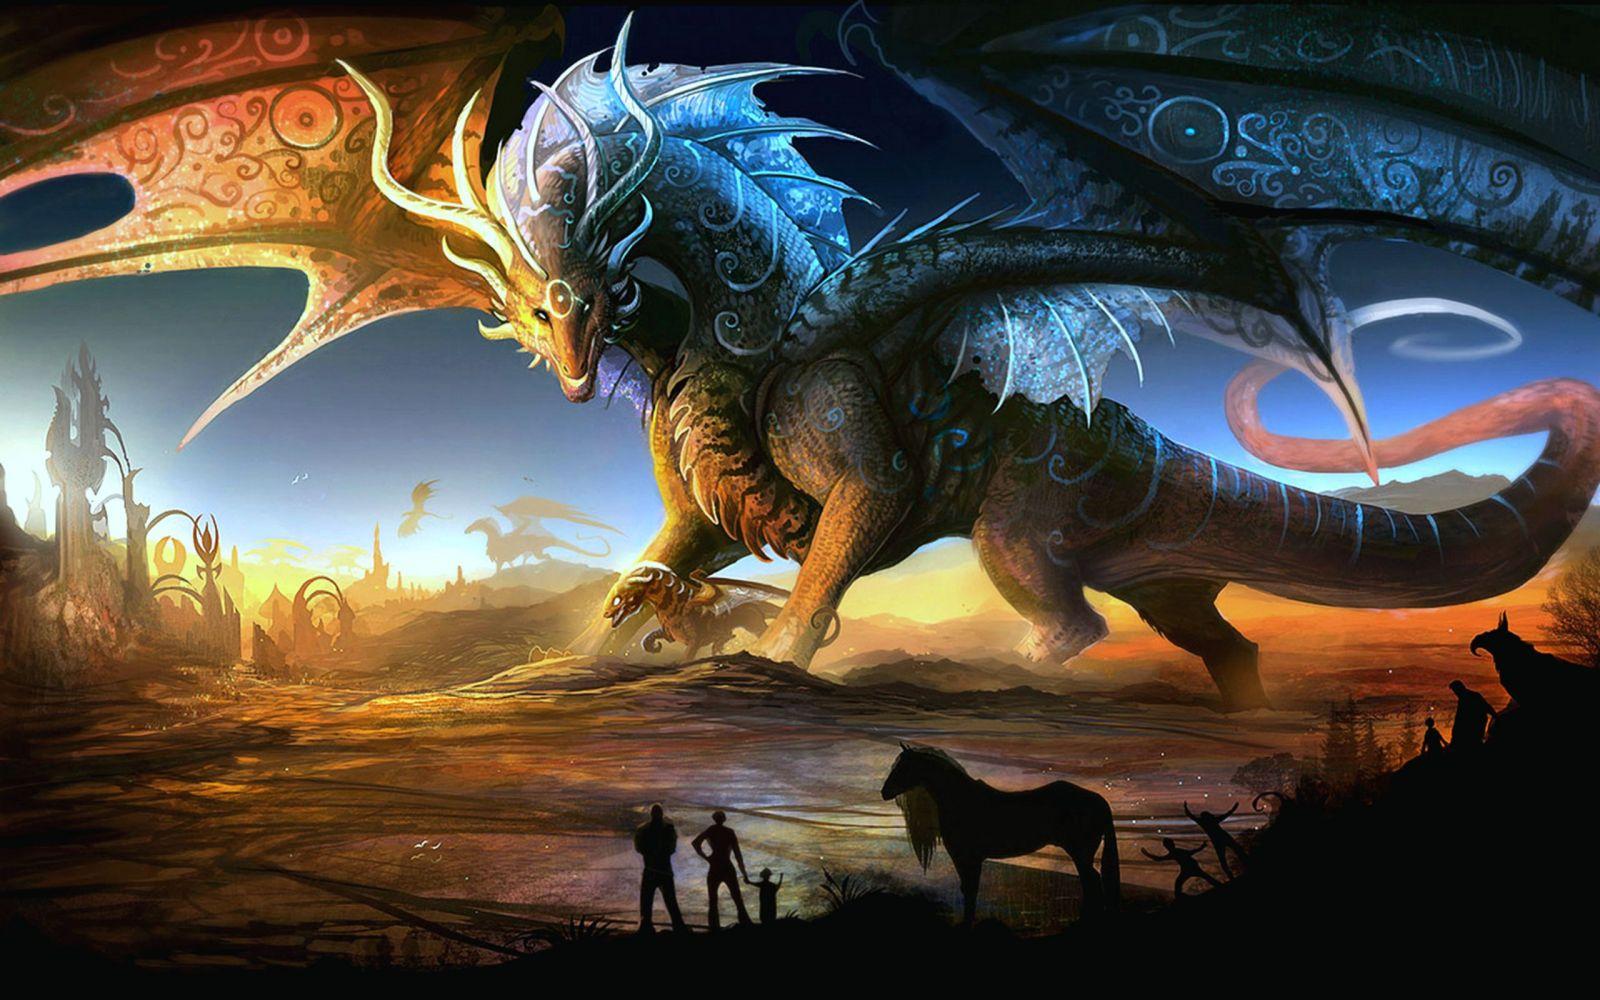 Коллекция картинок: Еще драконы: madamkartinki.blogspot.com/2013/03/blog-post_13.html